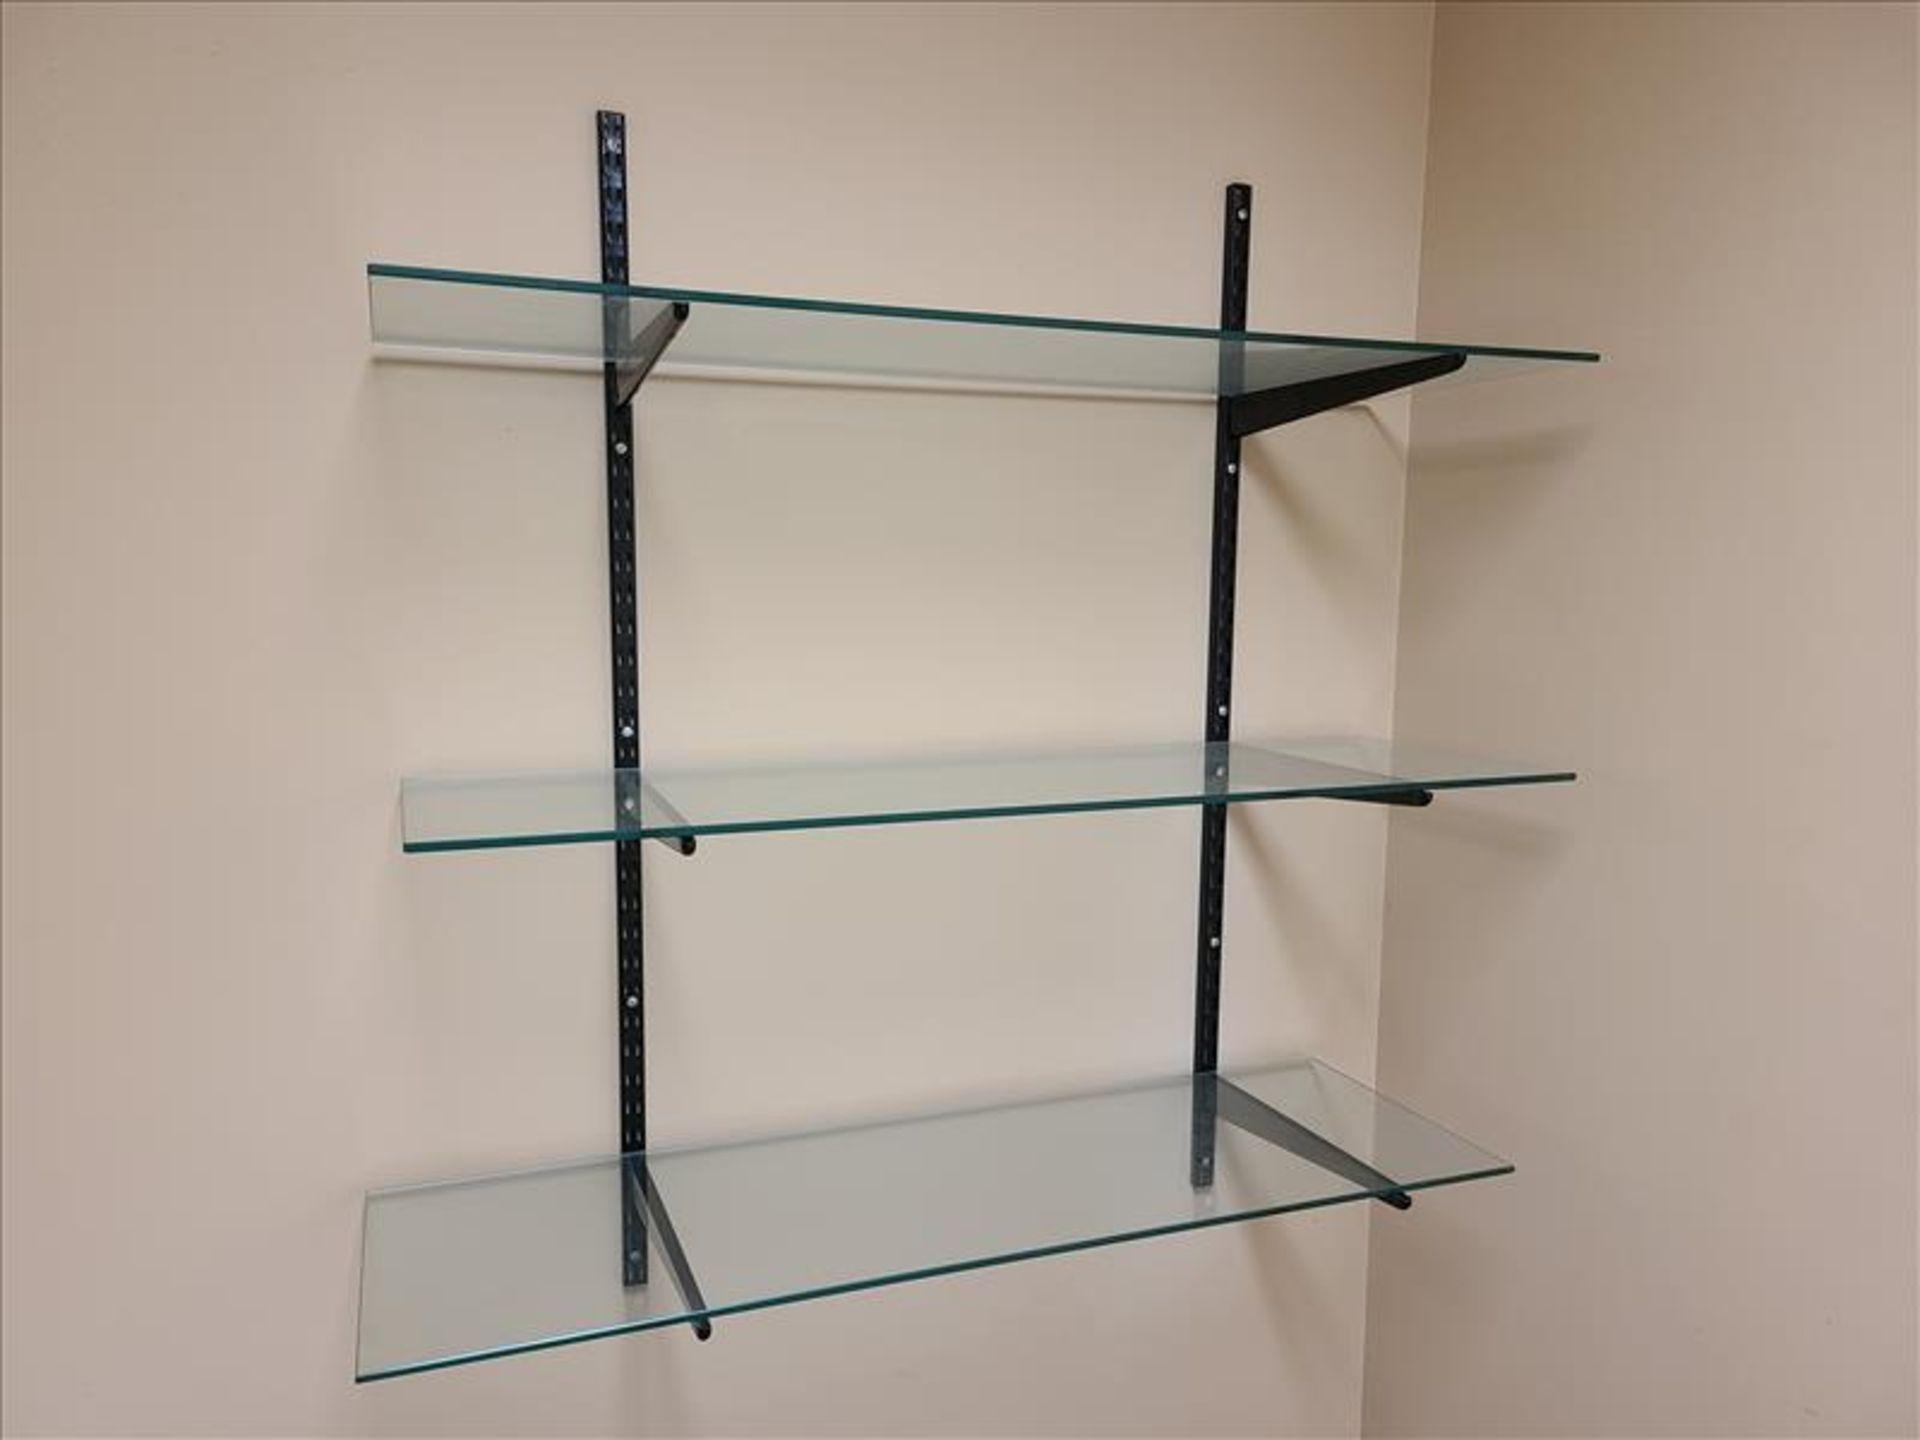 3 Tier Adjustable Tempered Glass Shelf - Image 2 of 2